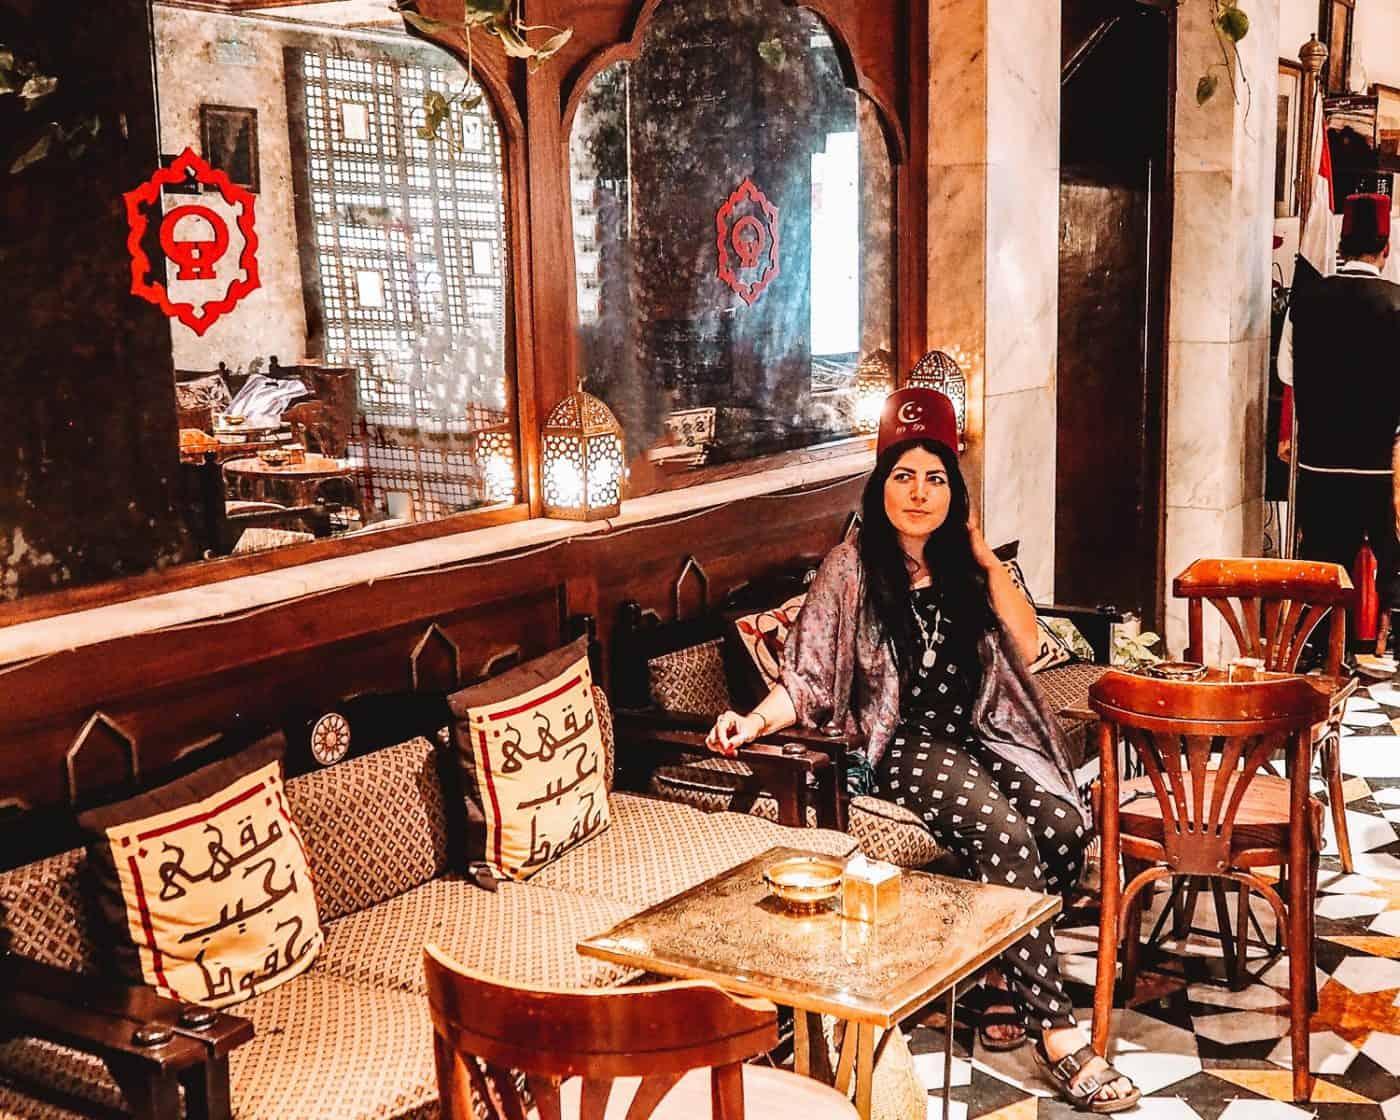 Naguib Mahfouz Cafe Khan el Khalili Restaurant Cairo